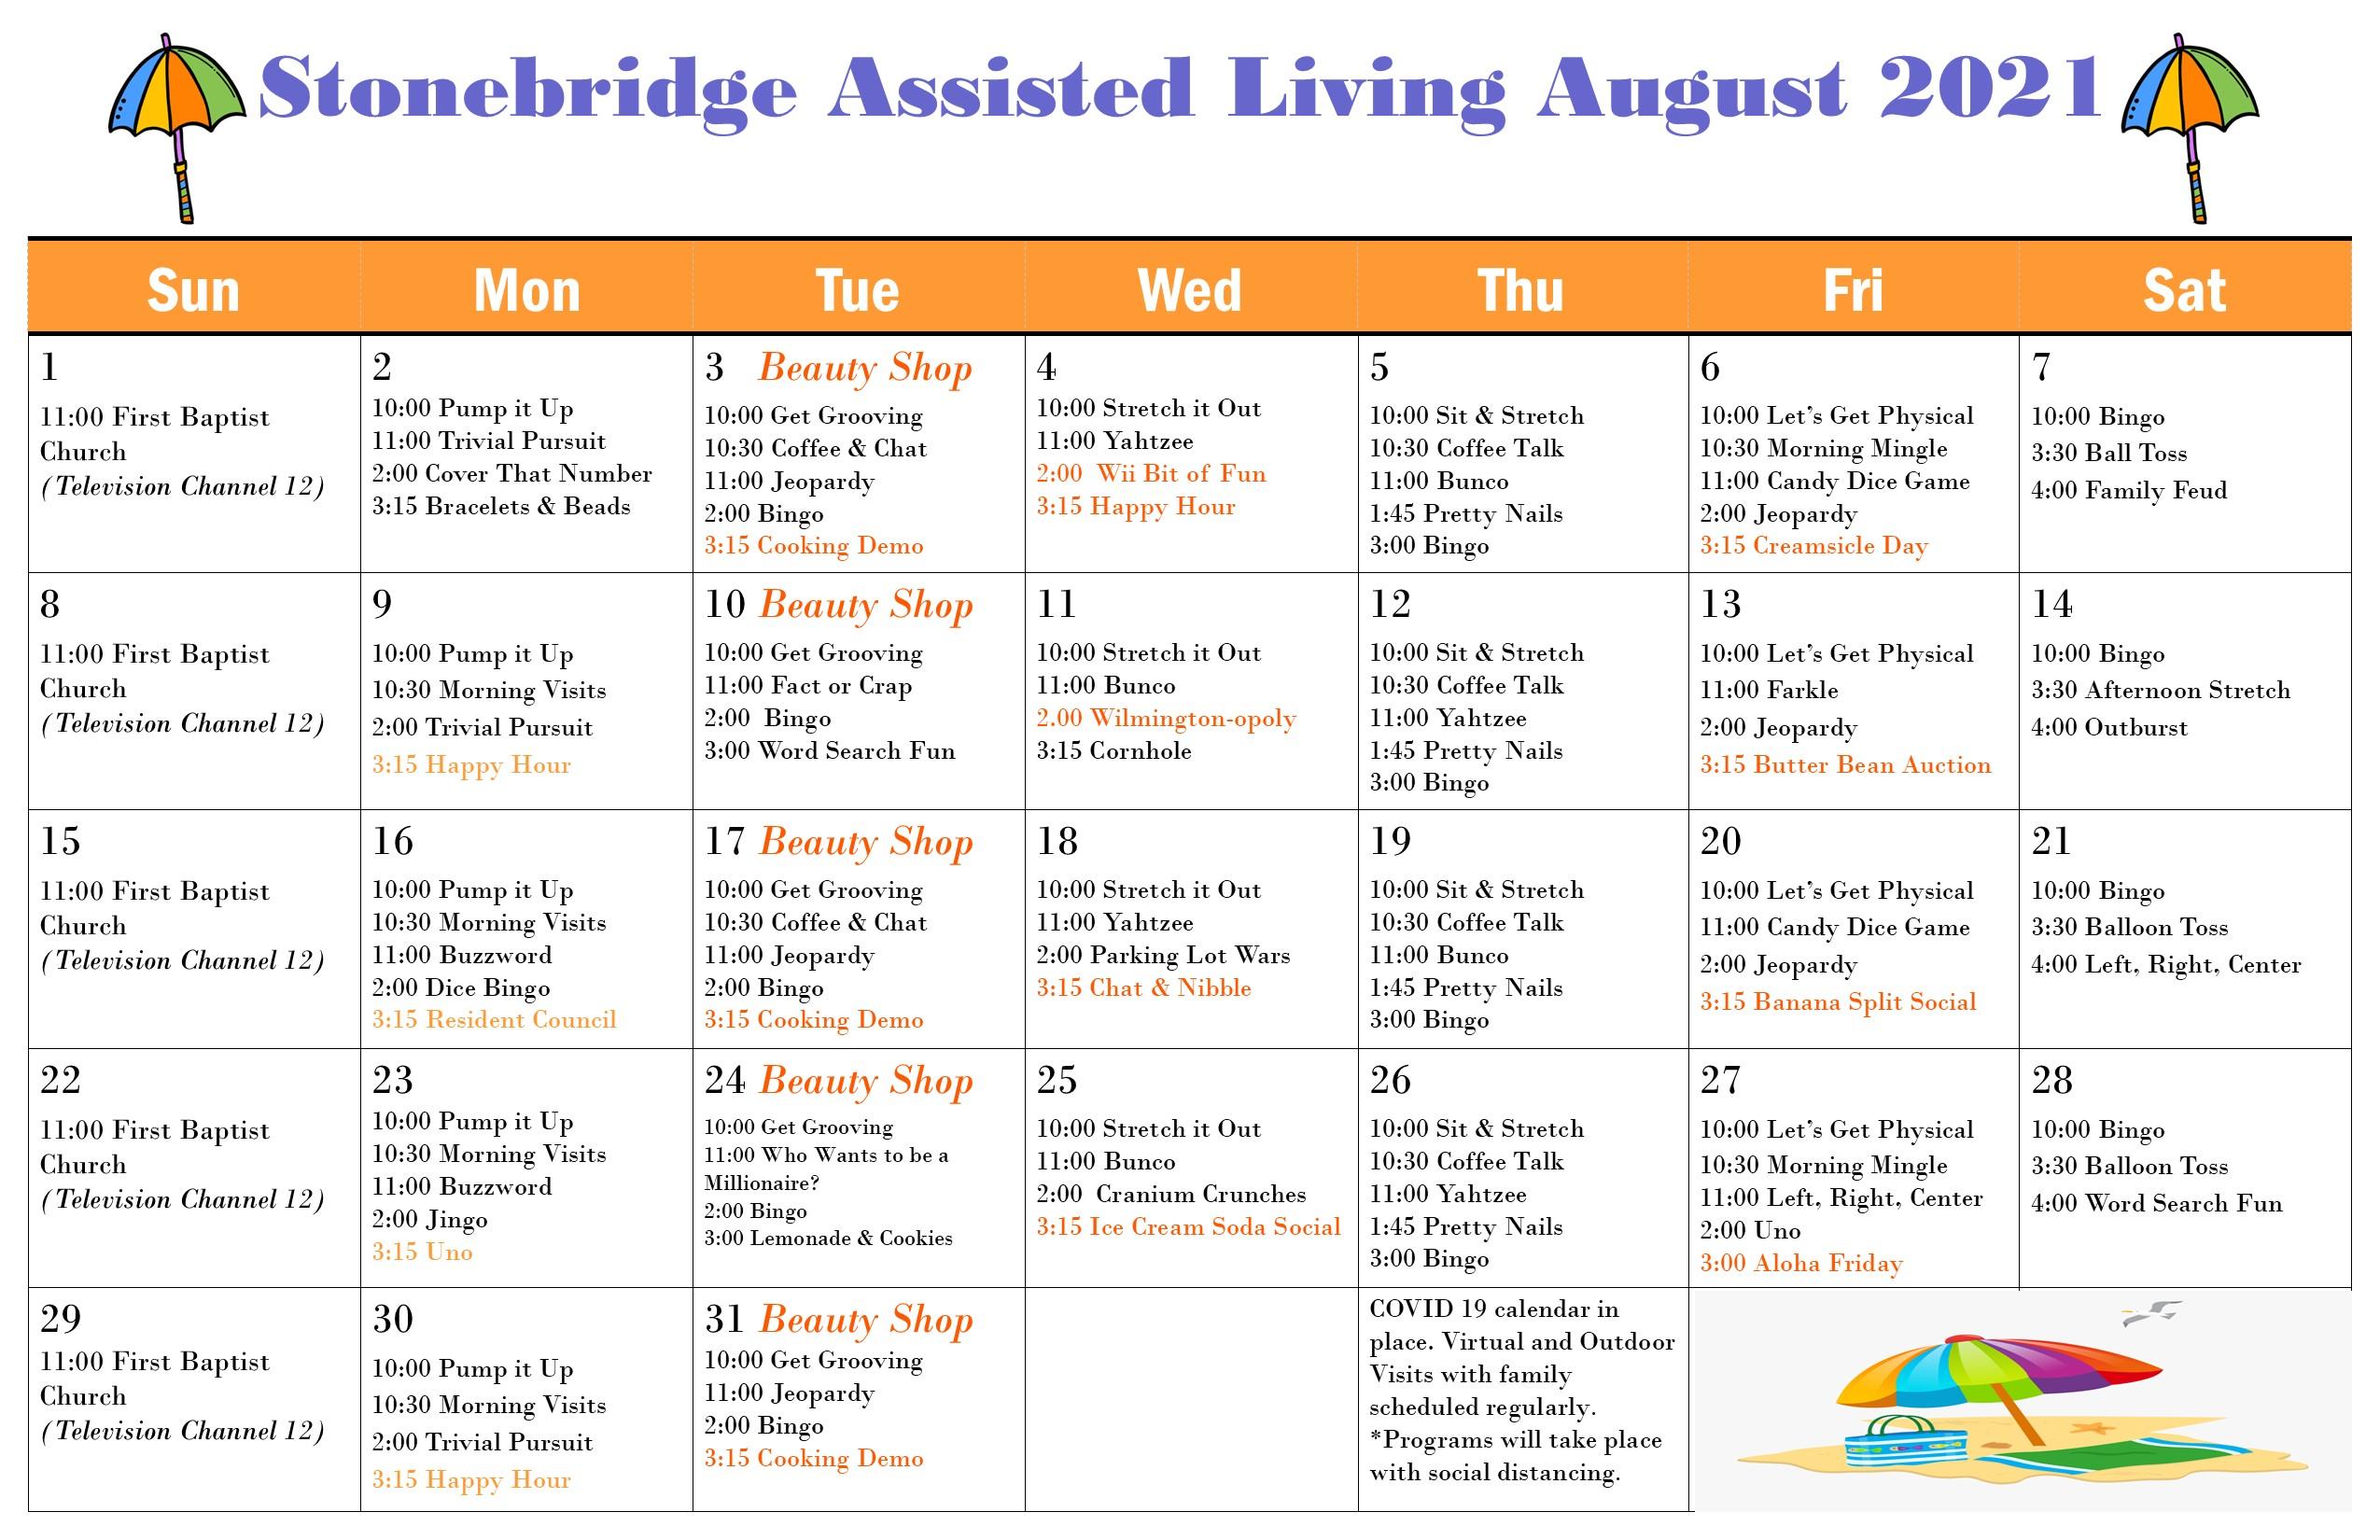 Stonebridge August 2021 Events Calendar